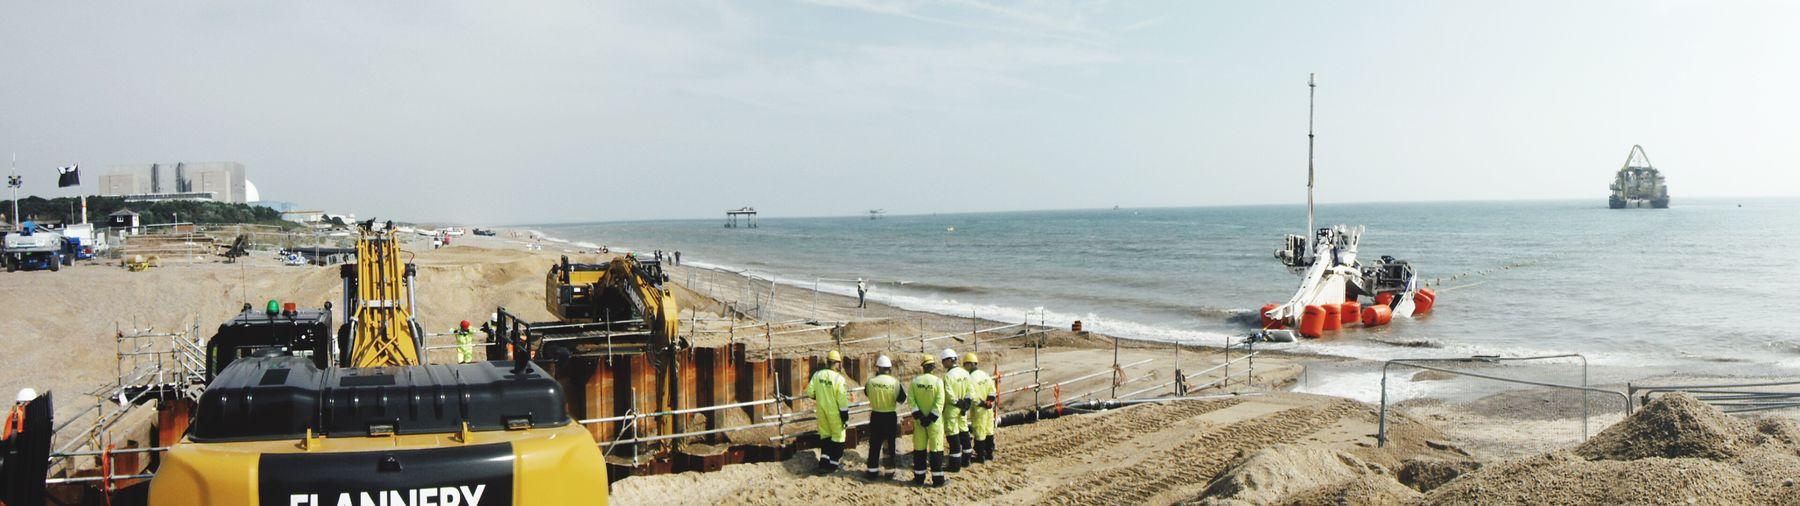 Cable installation works in the Galloper Wind Farm Nautical Vessel Coastline First Eyeem Photo